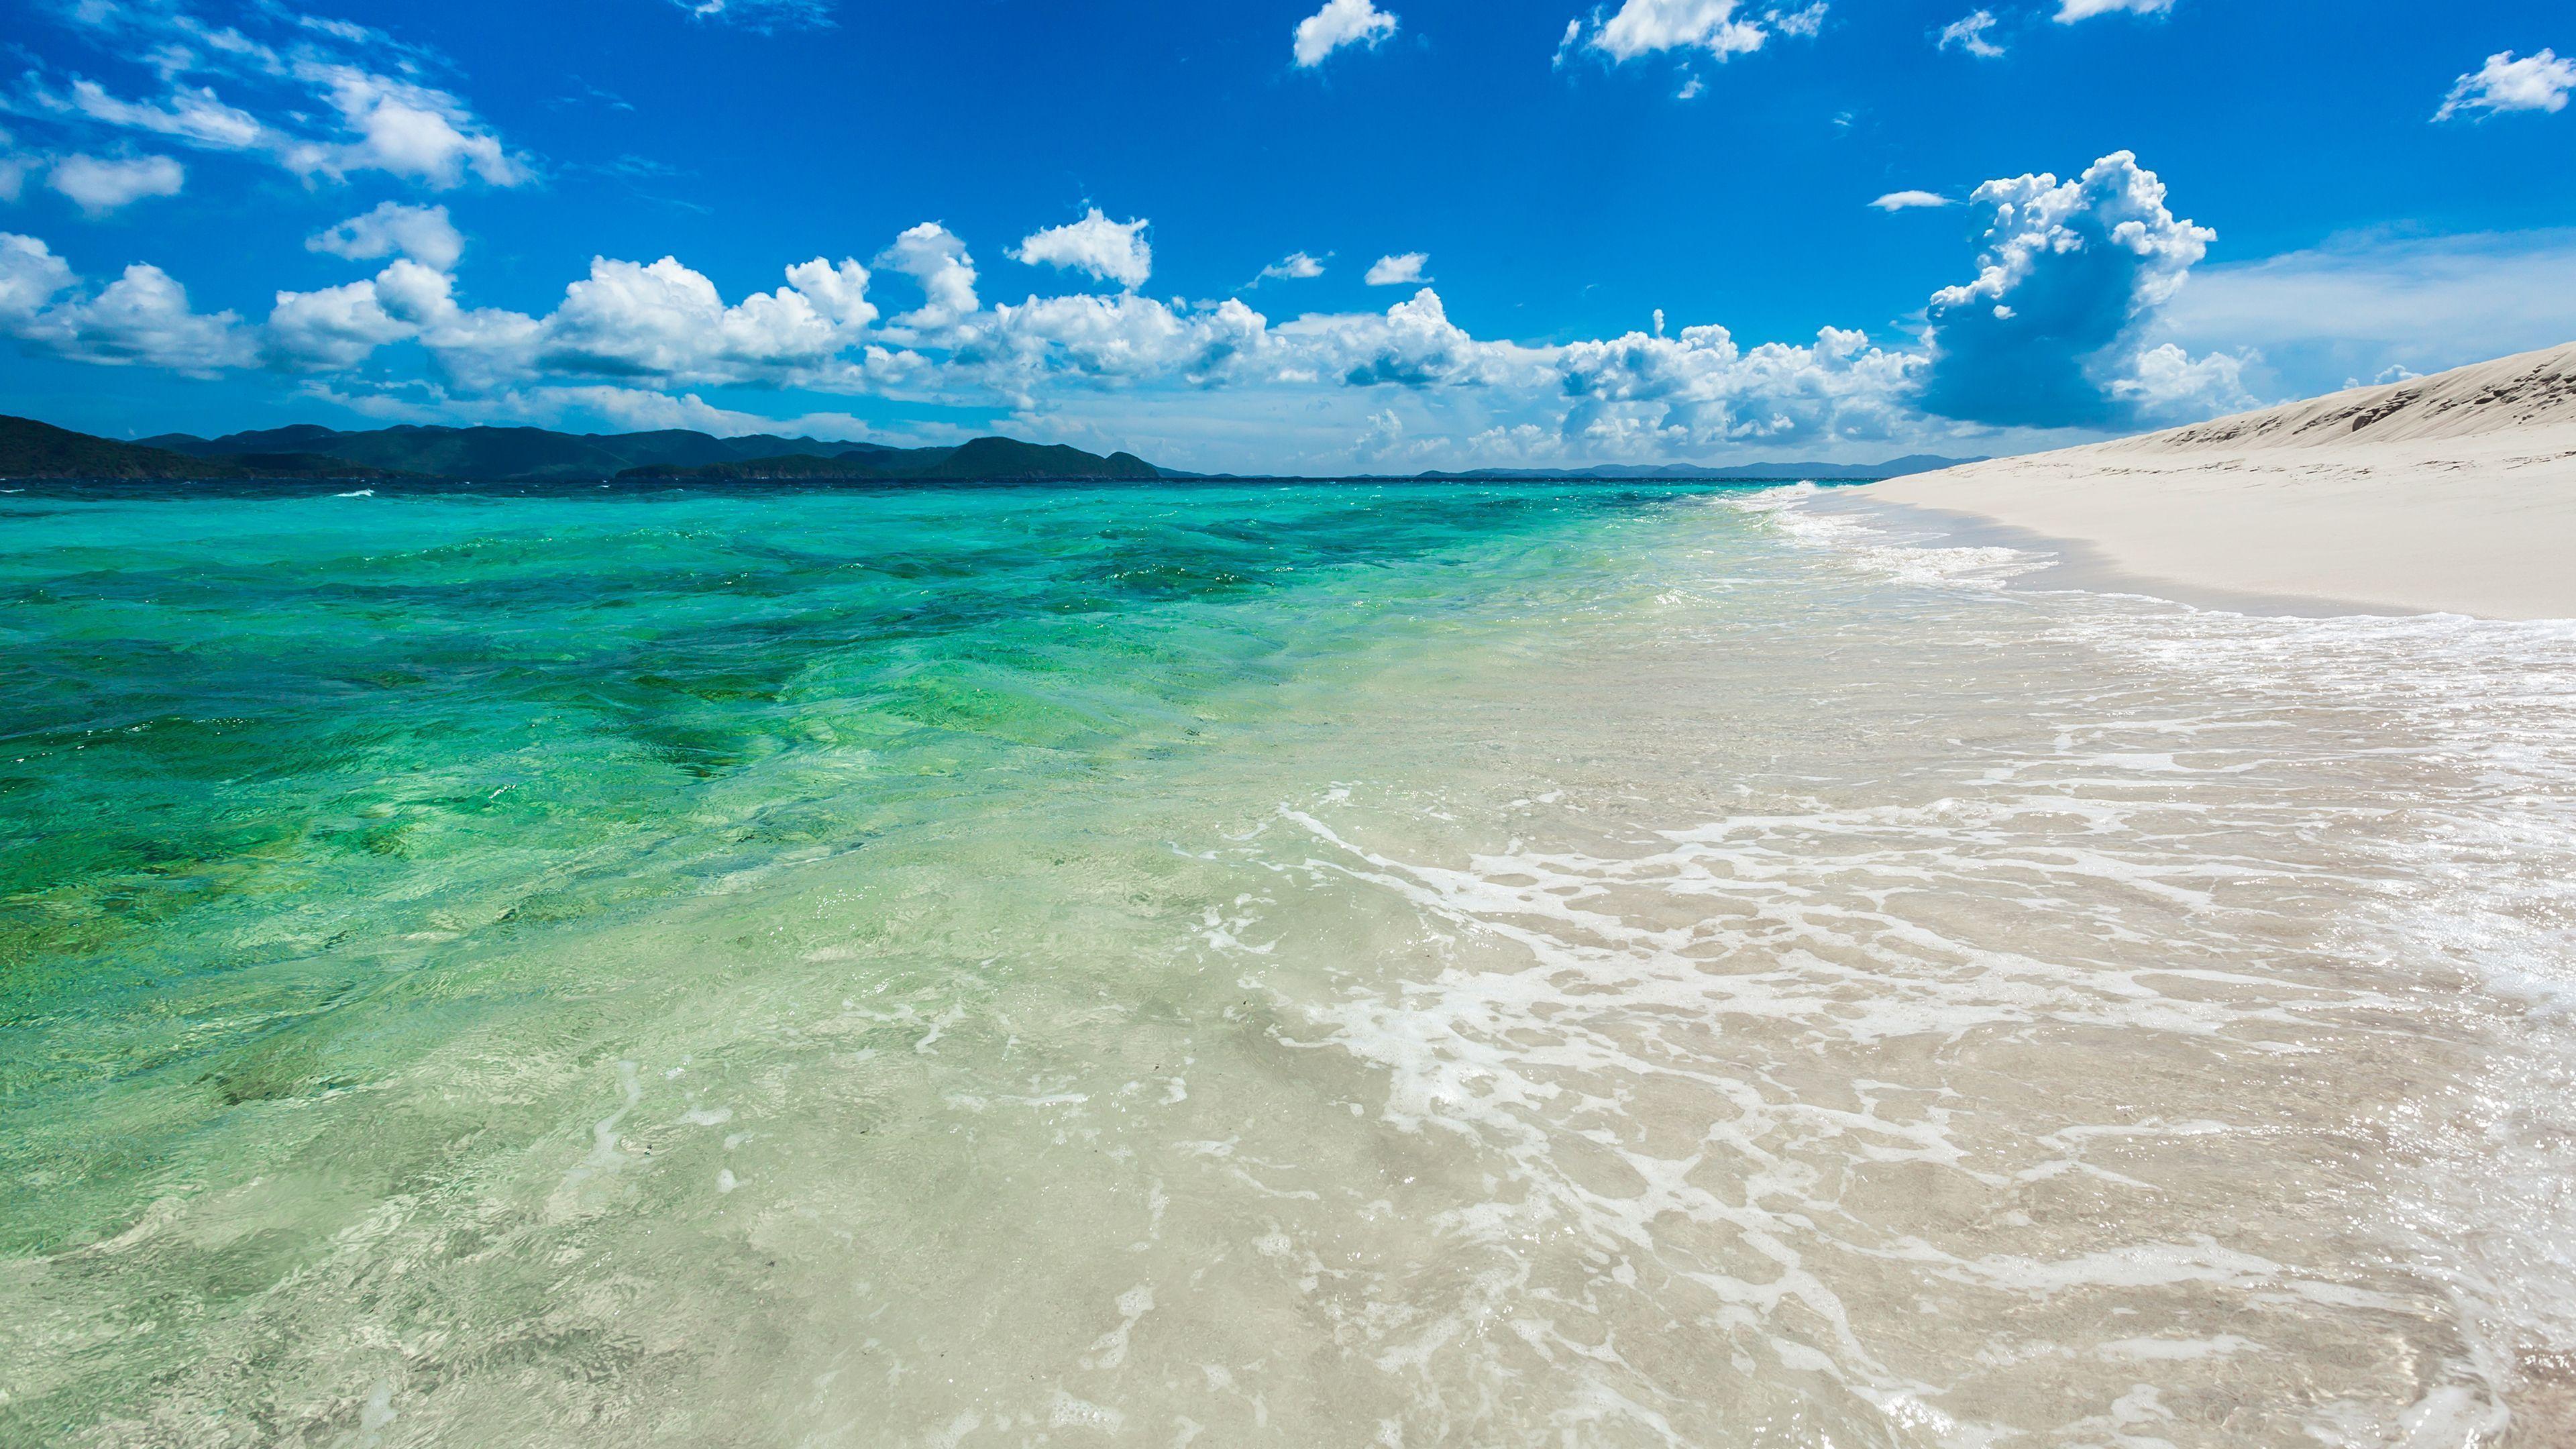 32k Ultra Hd Beach Wallpapers Top Free 32k Ultra Hd Beach